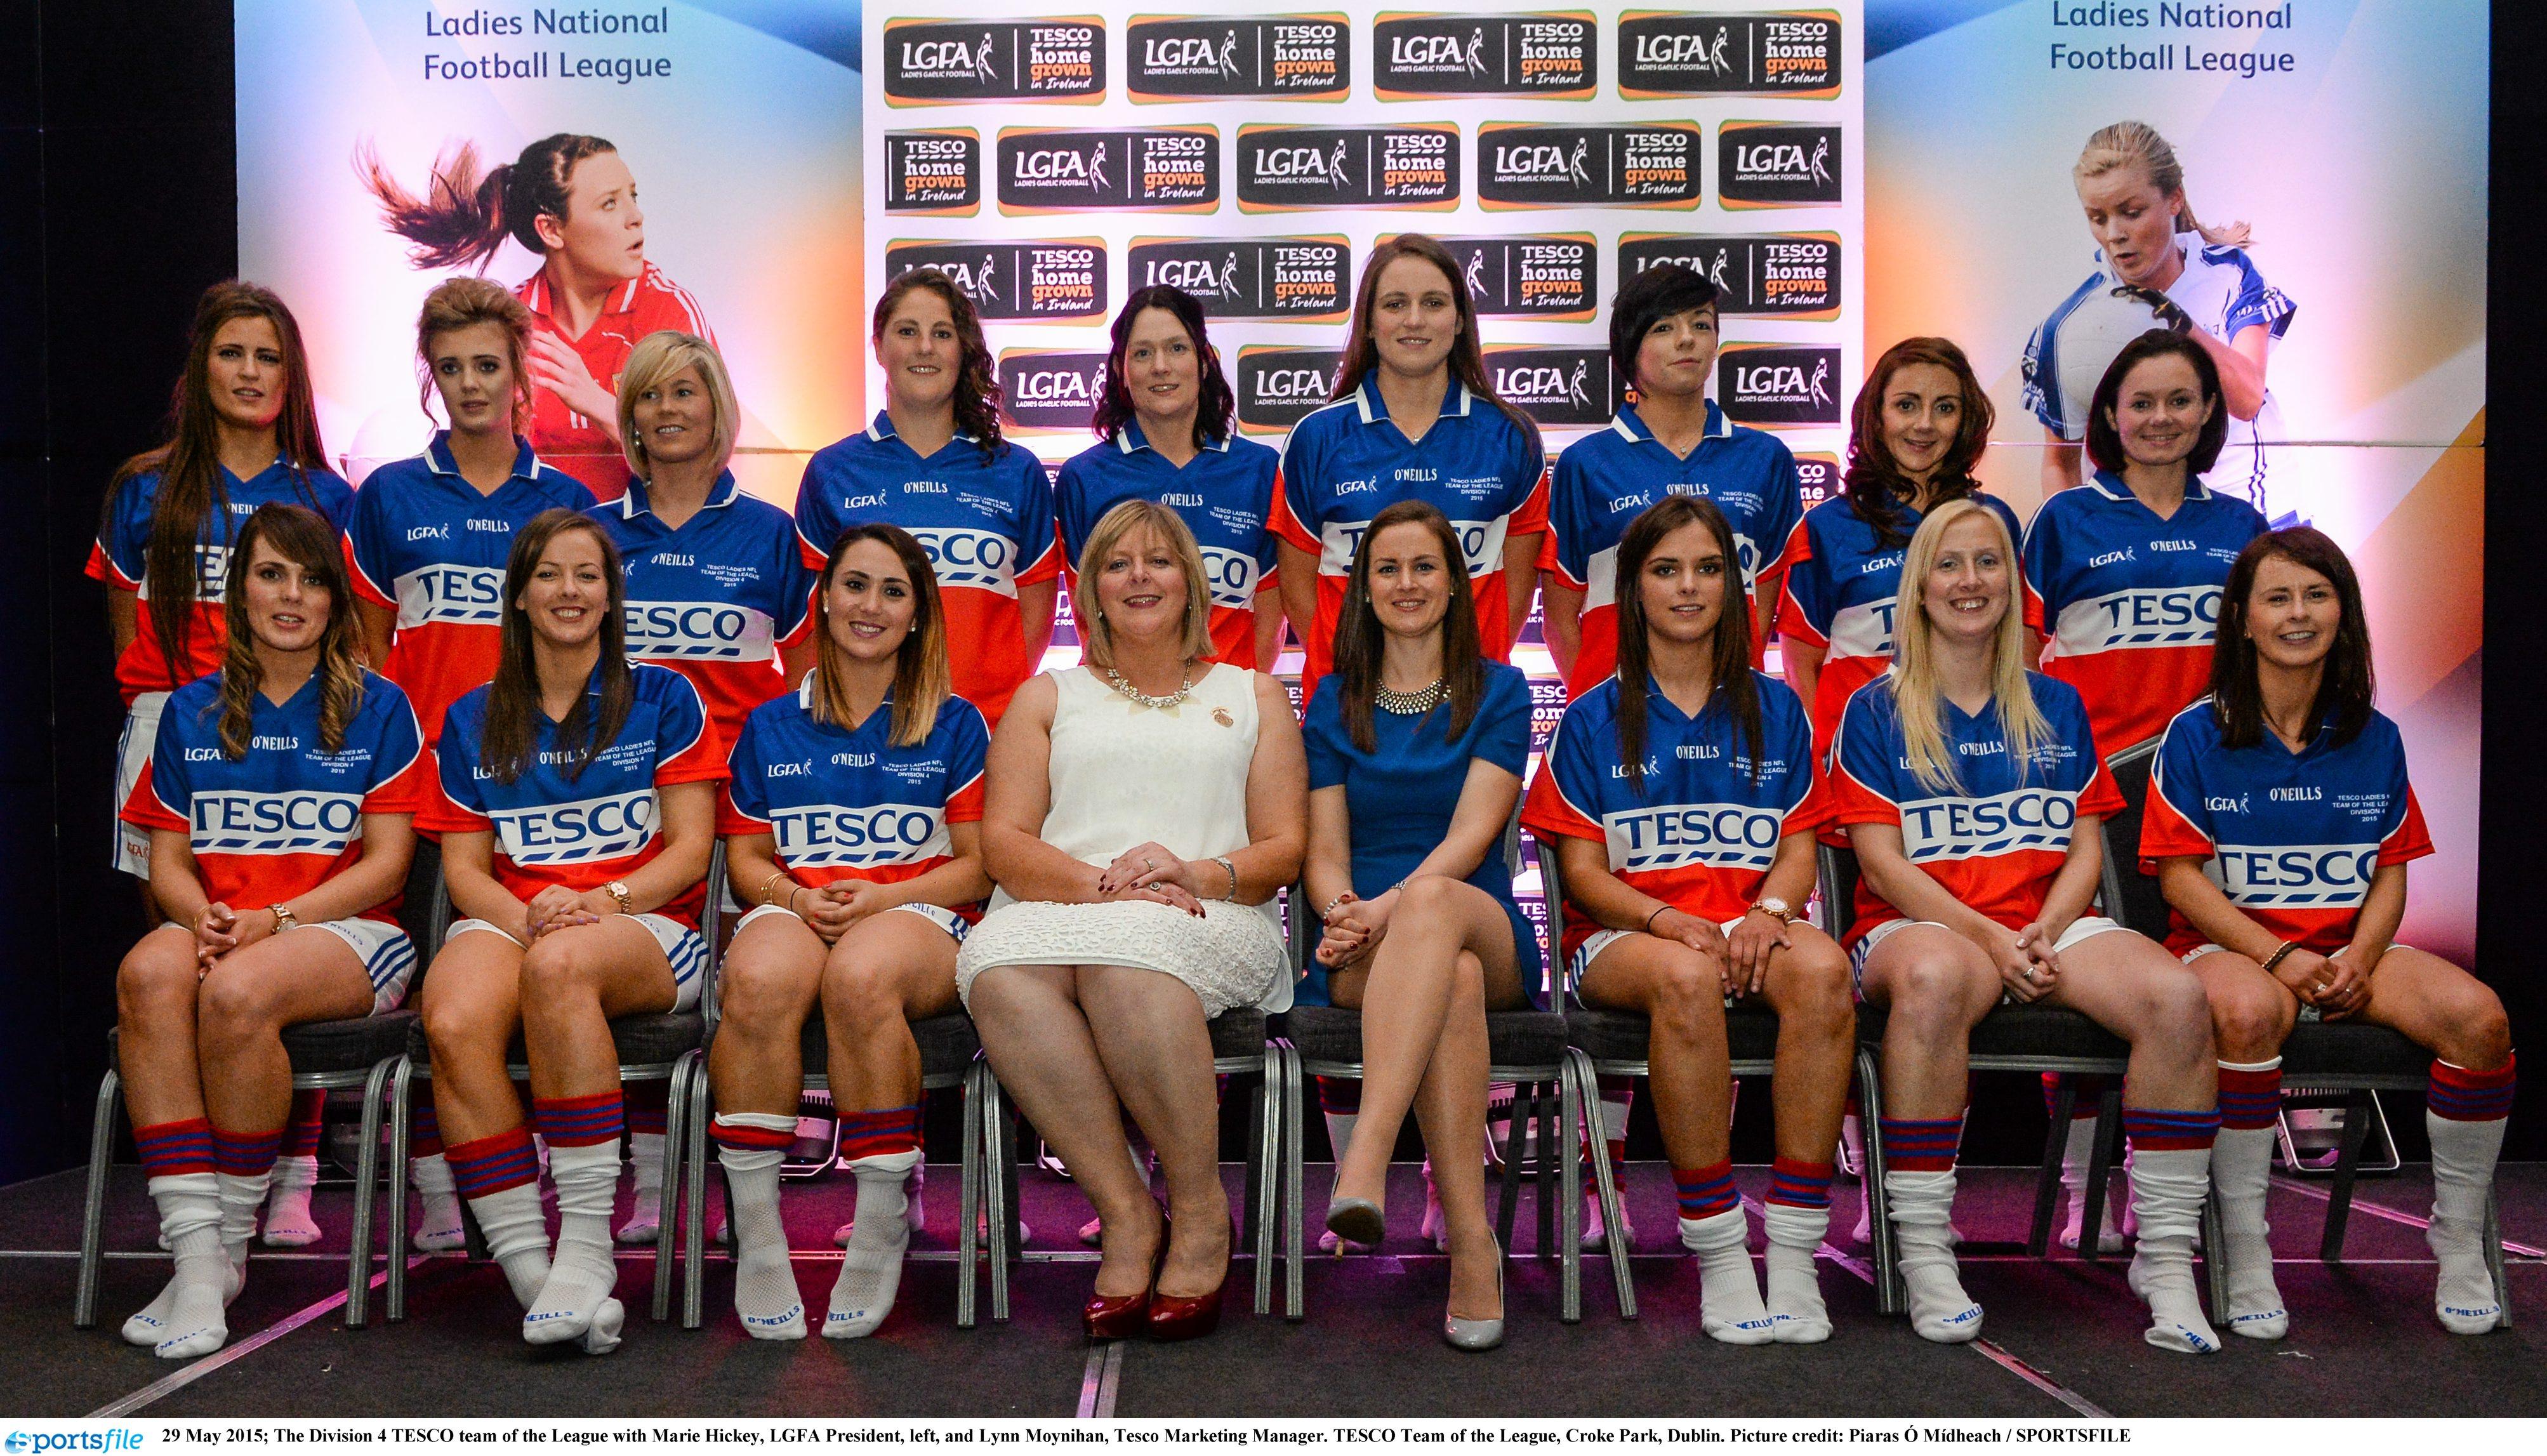 29 May 2015; The Division 4 TESCO team of the League with Marie Hickey, LGFA President, left, and Lynn Moynihan, Tesco Marketing Manager. TESCO Team of the League, Croke Park, Dublin. Picture credit: Piaras Ó Mídheach / SPORTSFILE